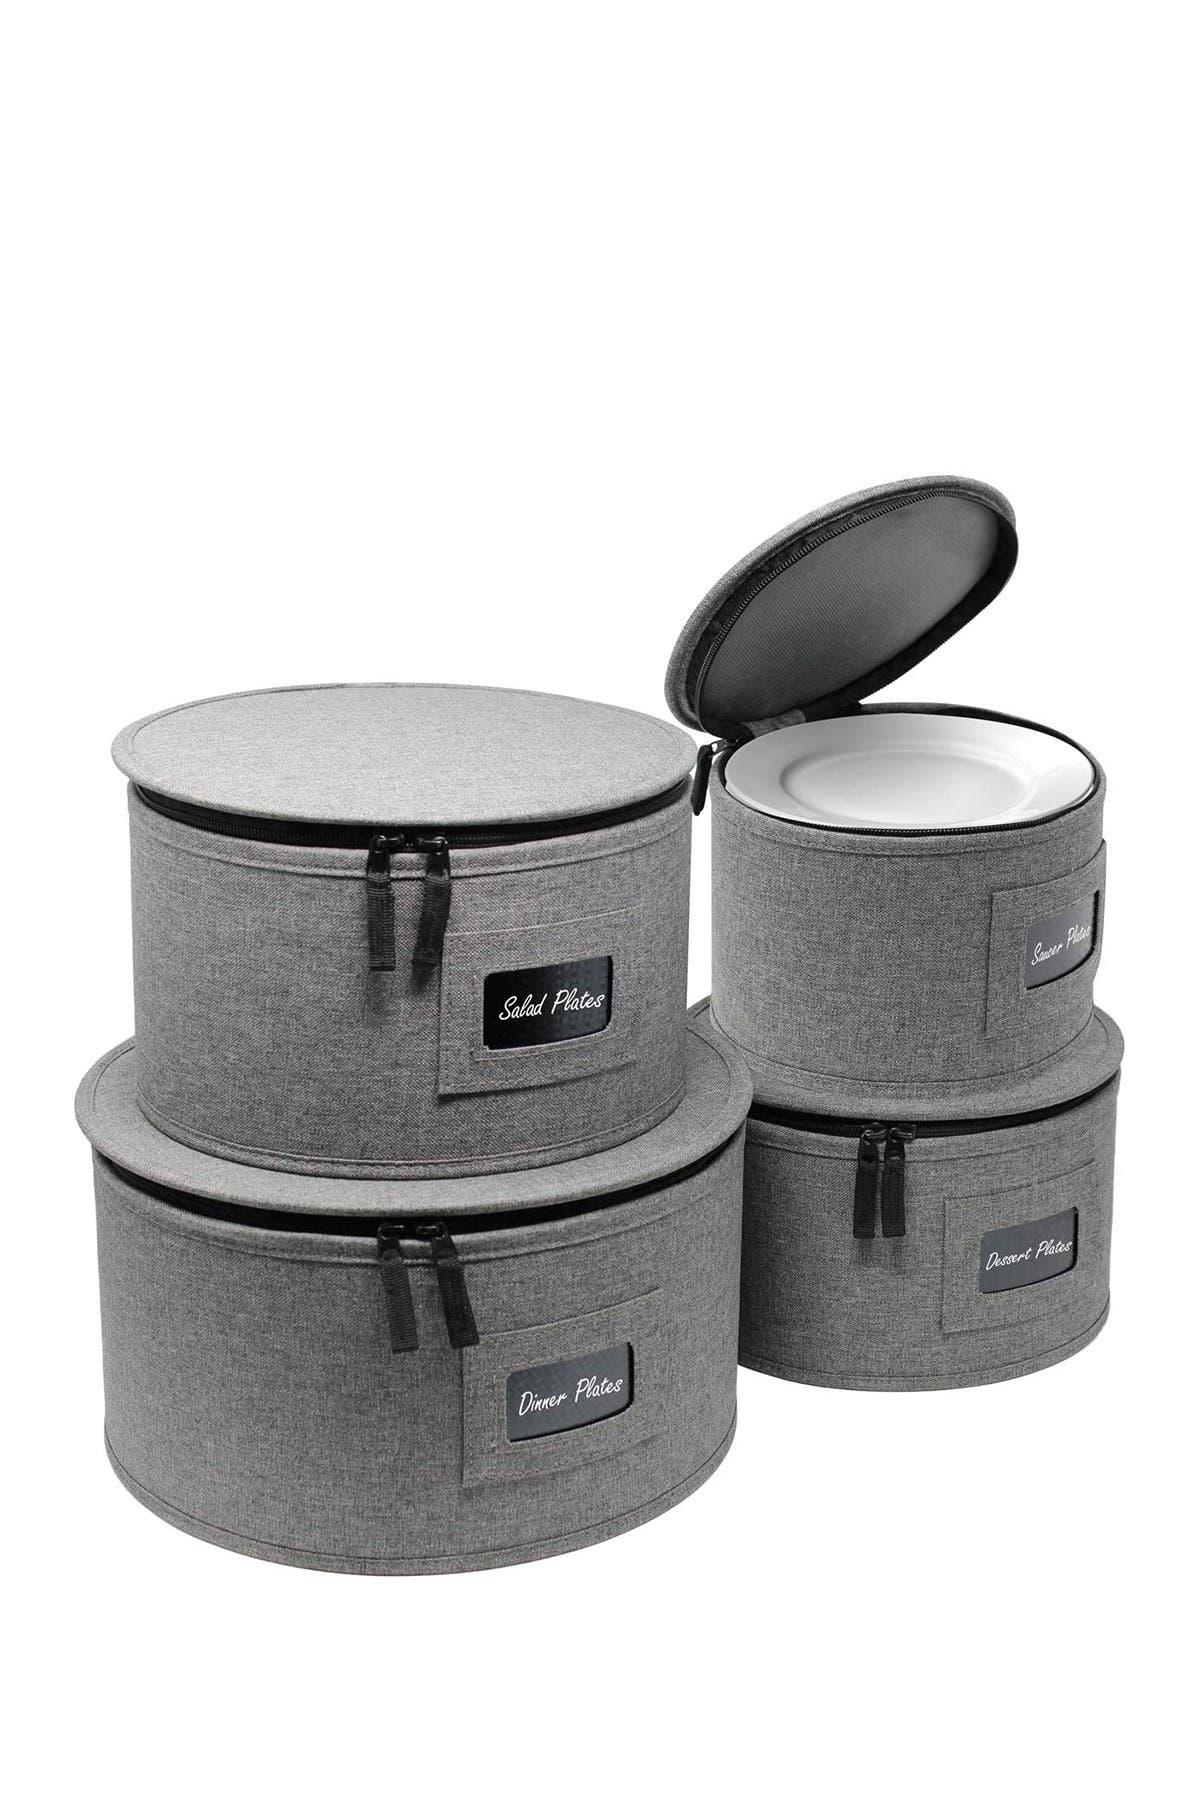 Image of Sorbus 4-Piece Dinnerware Storage Set - Grey